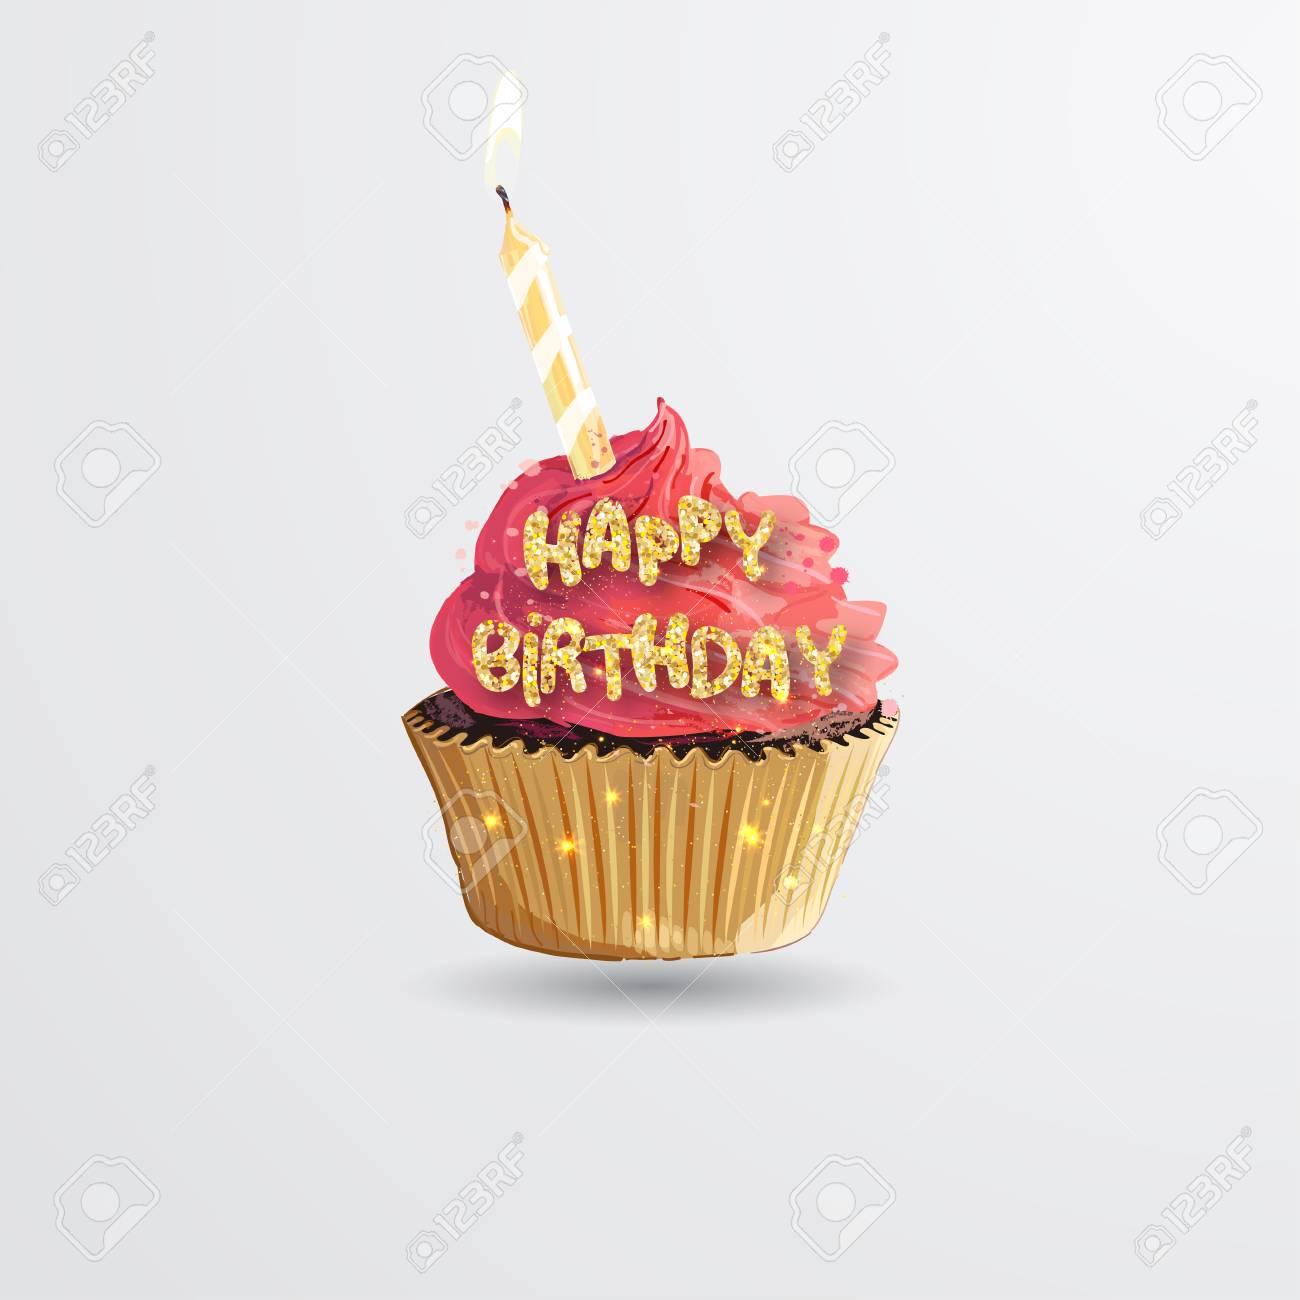 Wondrous Cupcake Sweet Birthday Cake With Candle Lit Happy Birthday Birthday Cards Printable Riciscafe Filternl